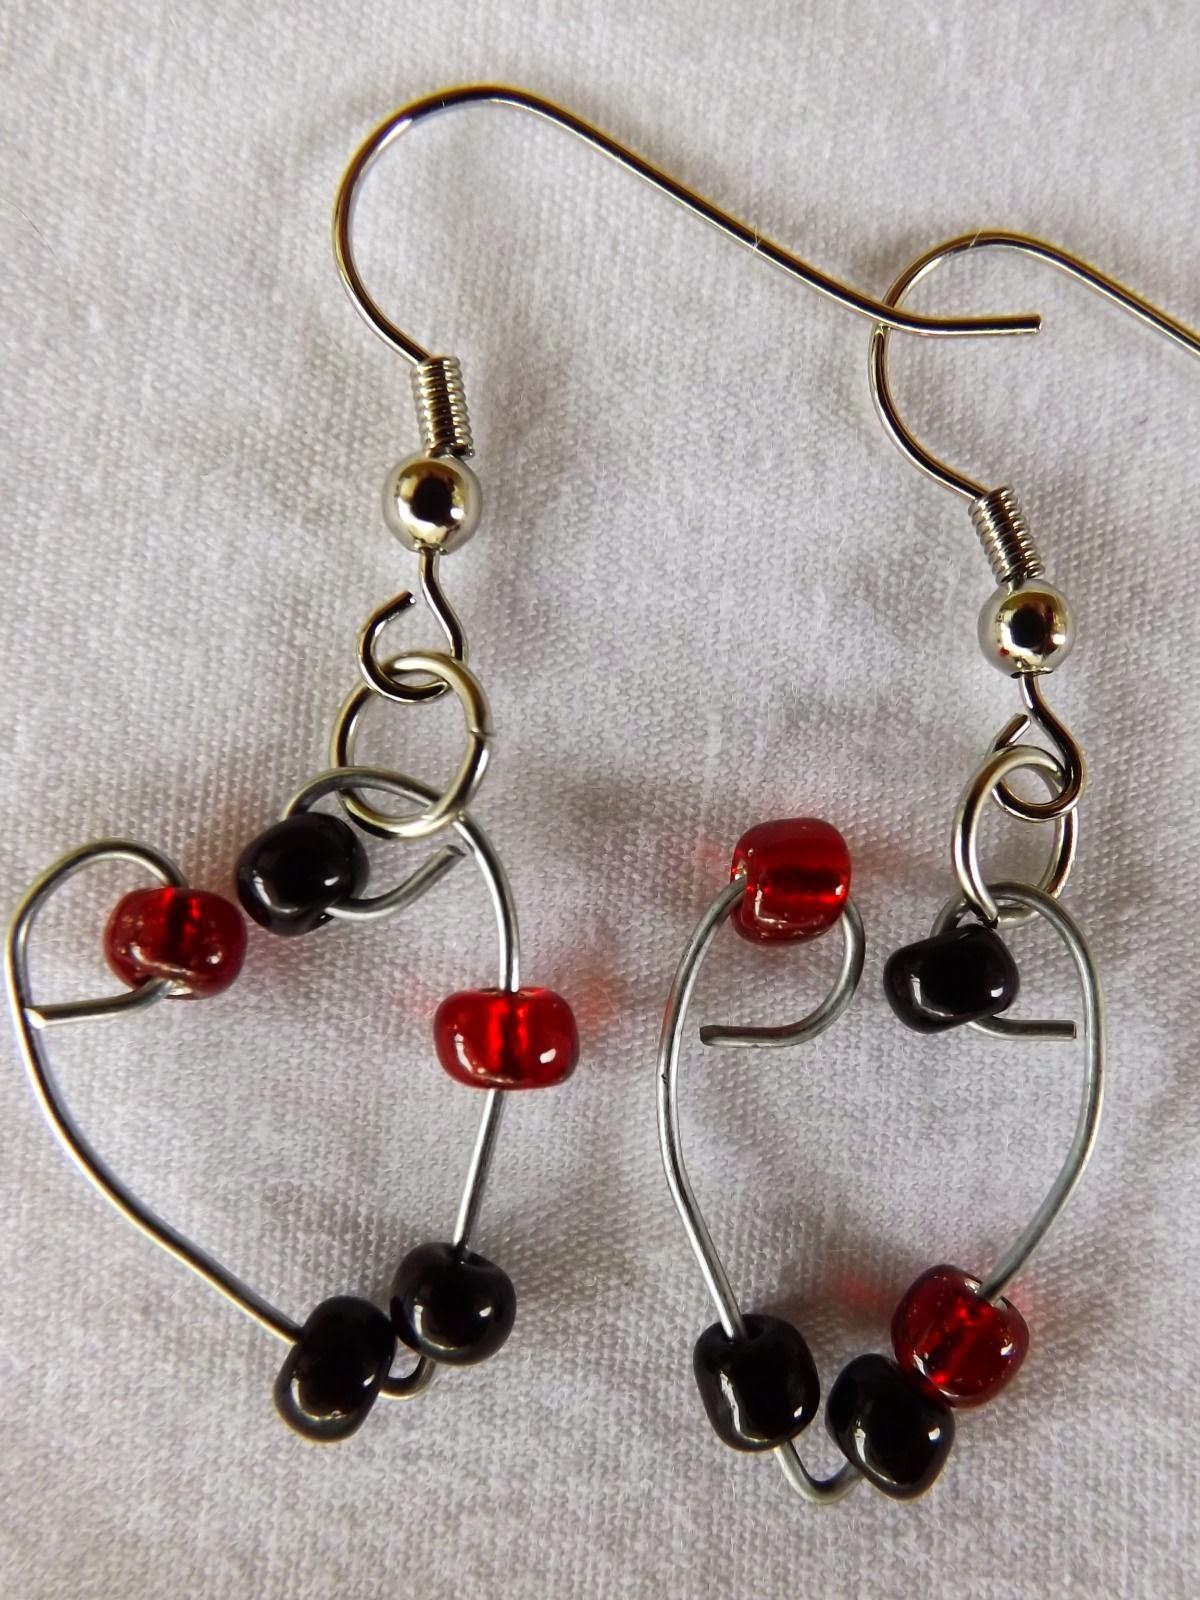 http://www.ebay.com/itm/Single-Heart-Earrings-Handmade-glass-dangle-with-stainless-steel-hook-/261770359867?fb_action_ids=318221801699656&fb_action_types=og.shares